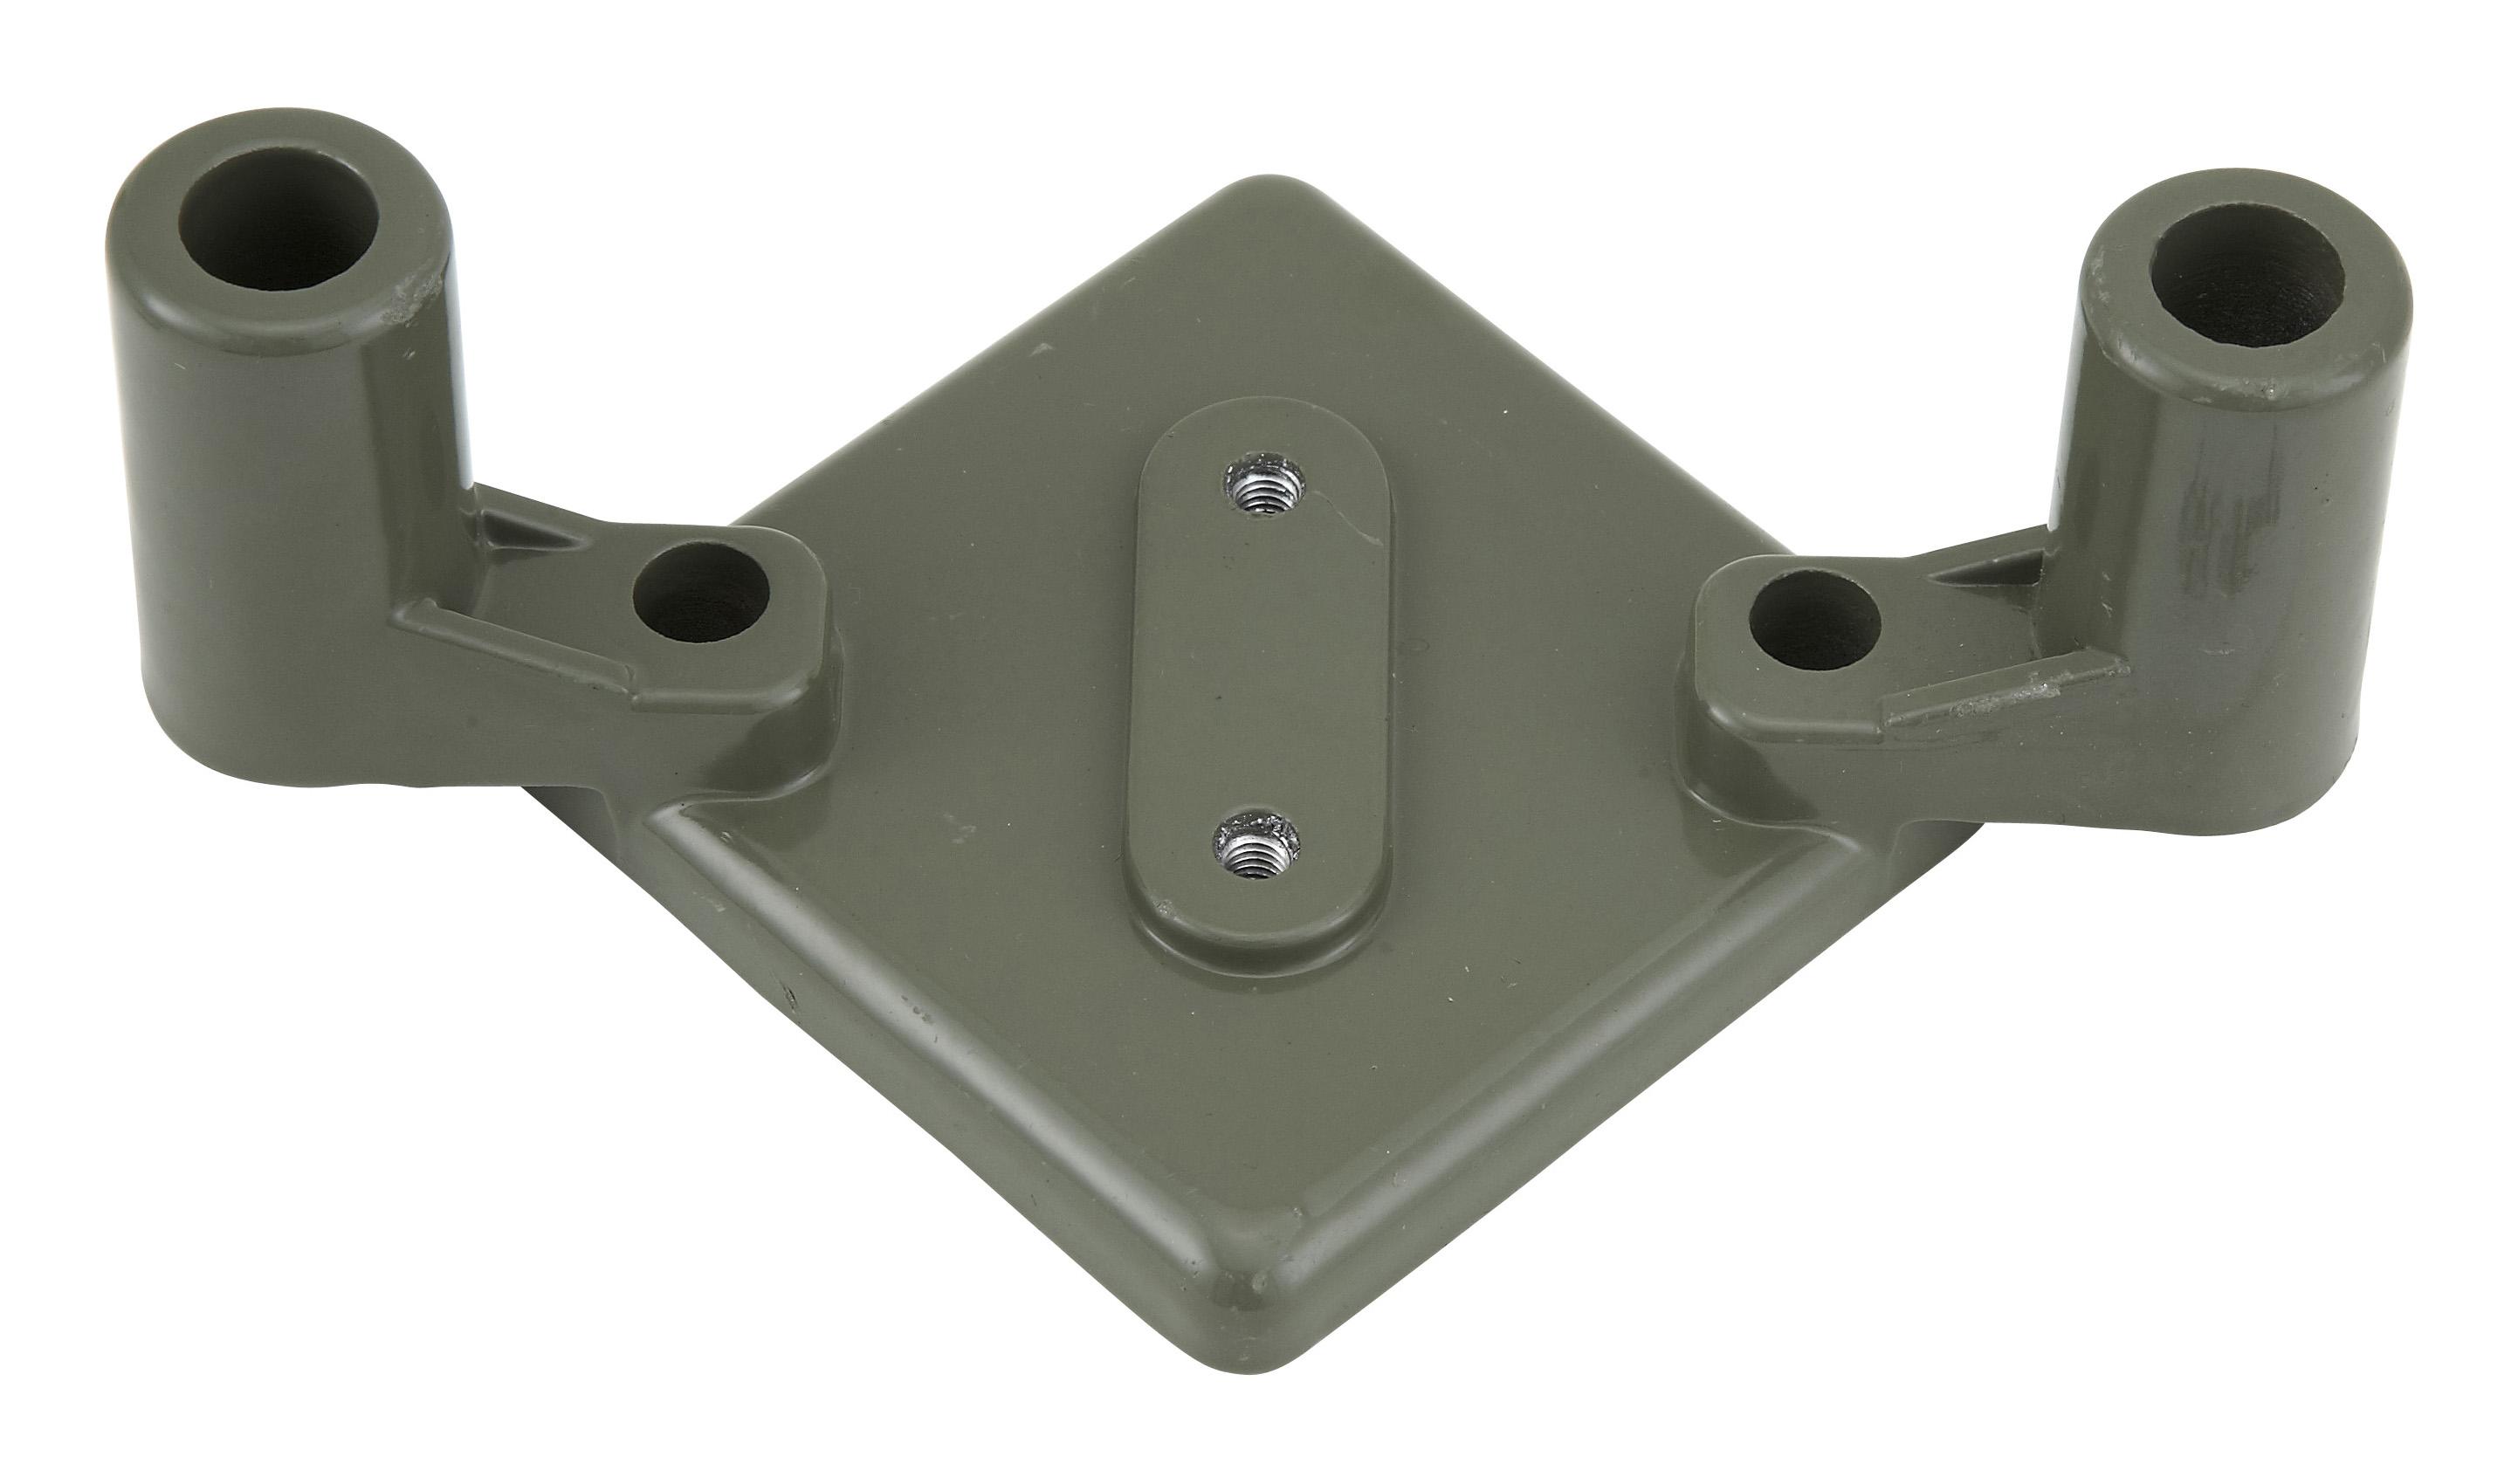 Winco FFC-500P push block